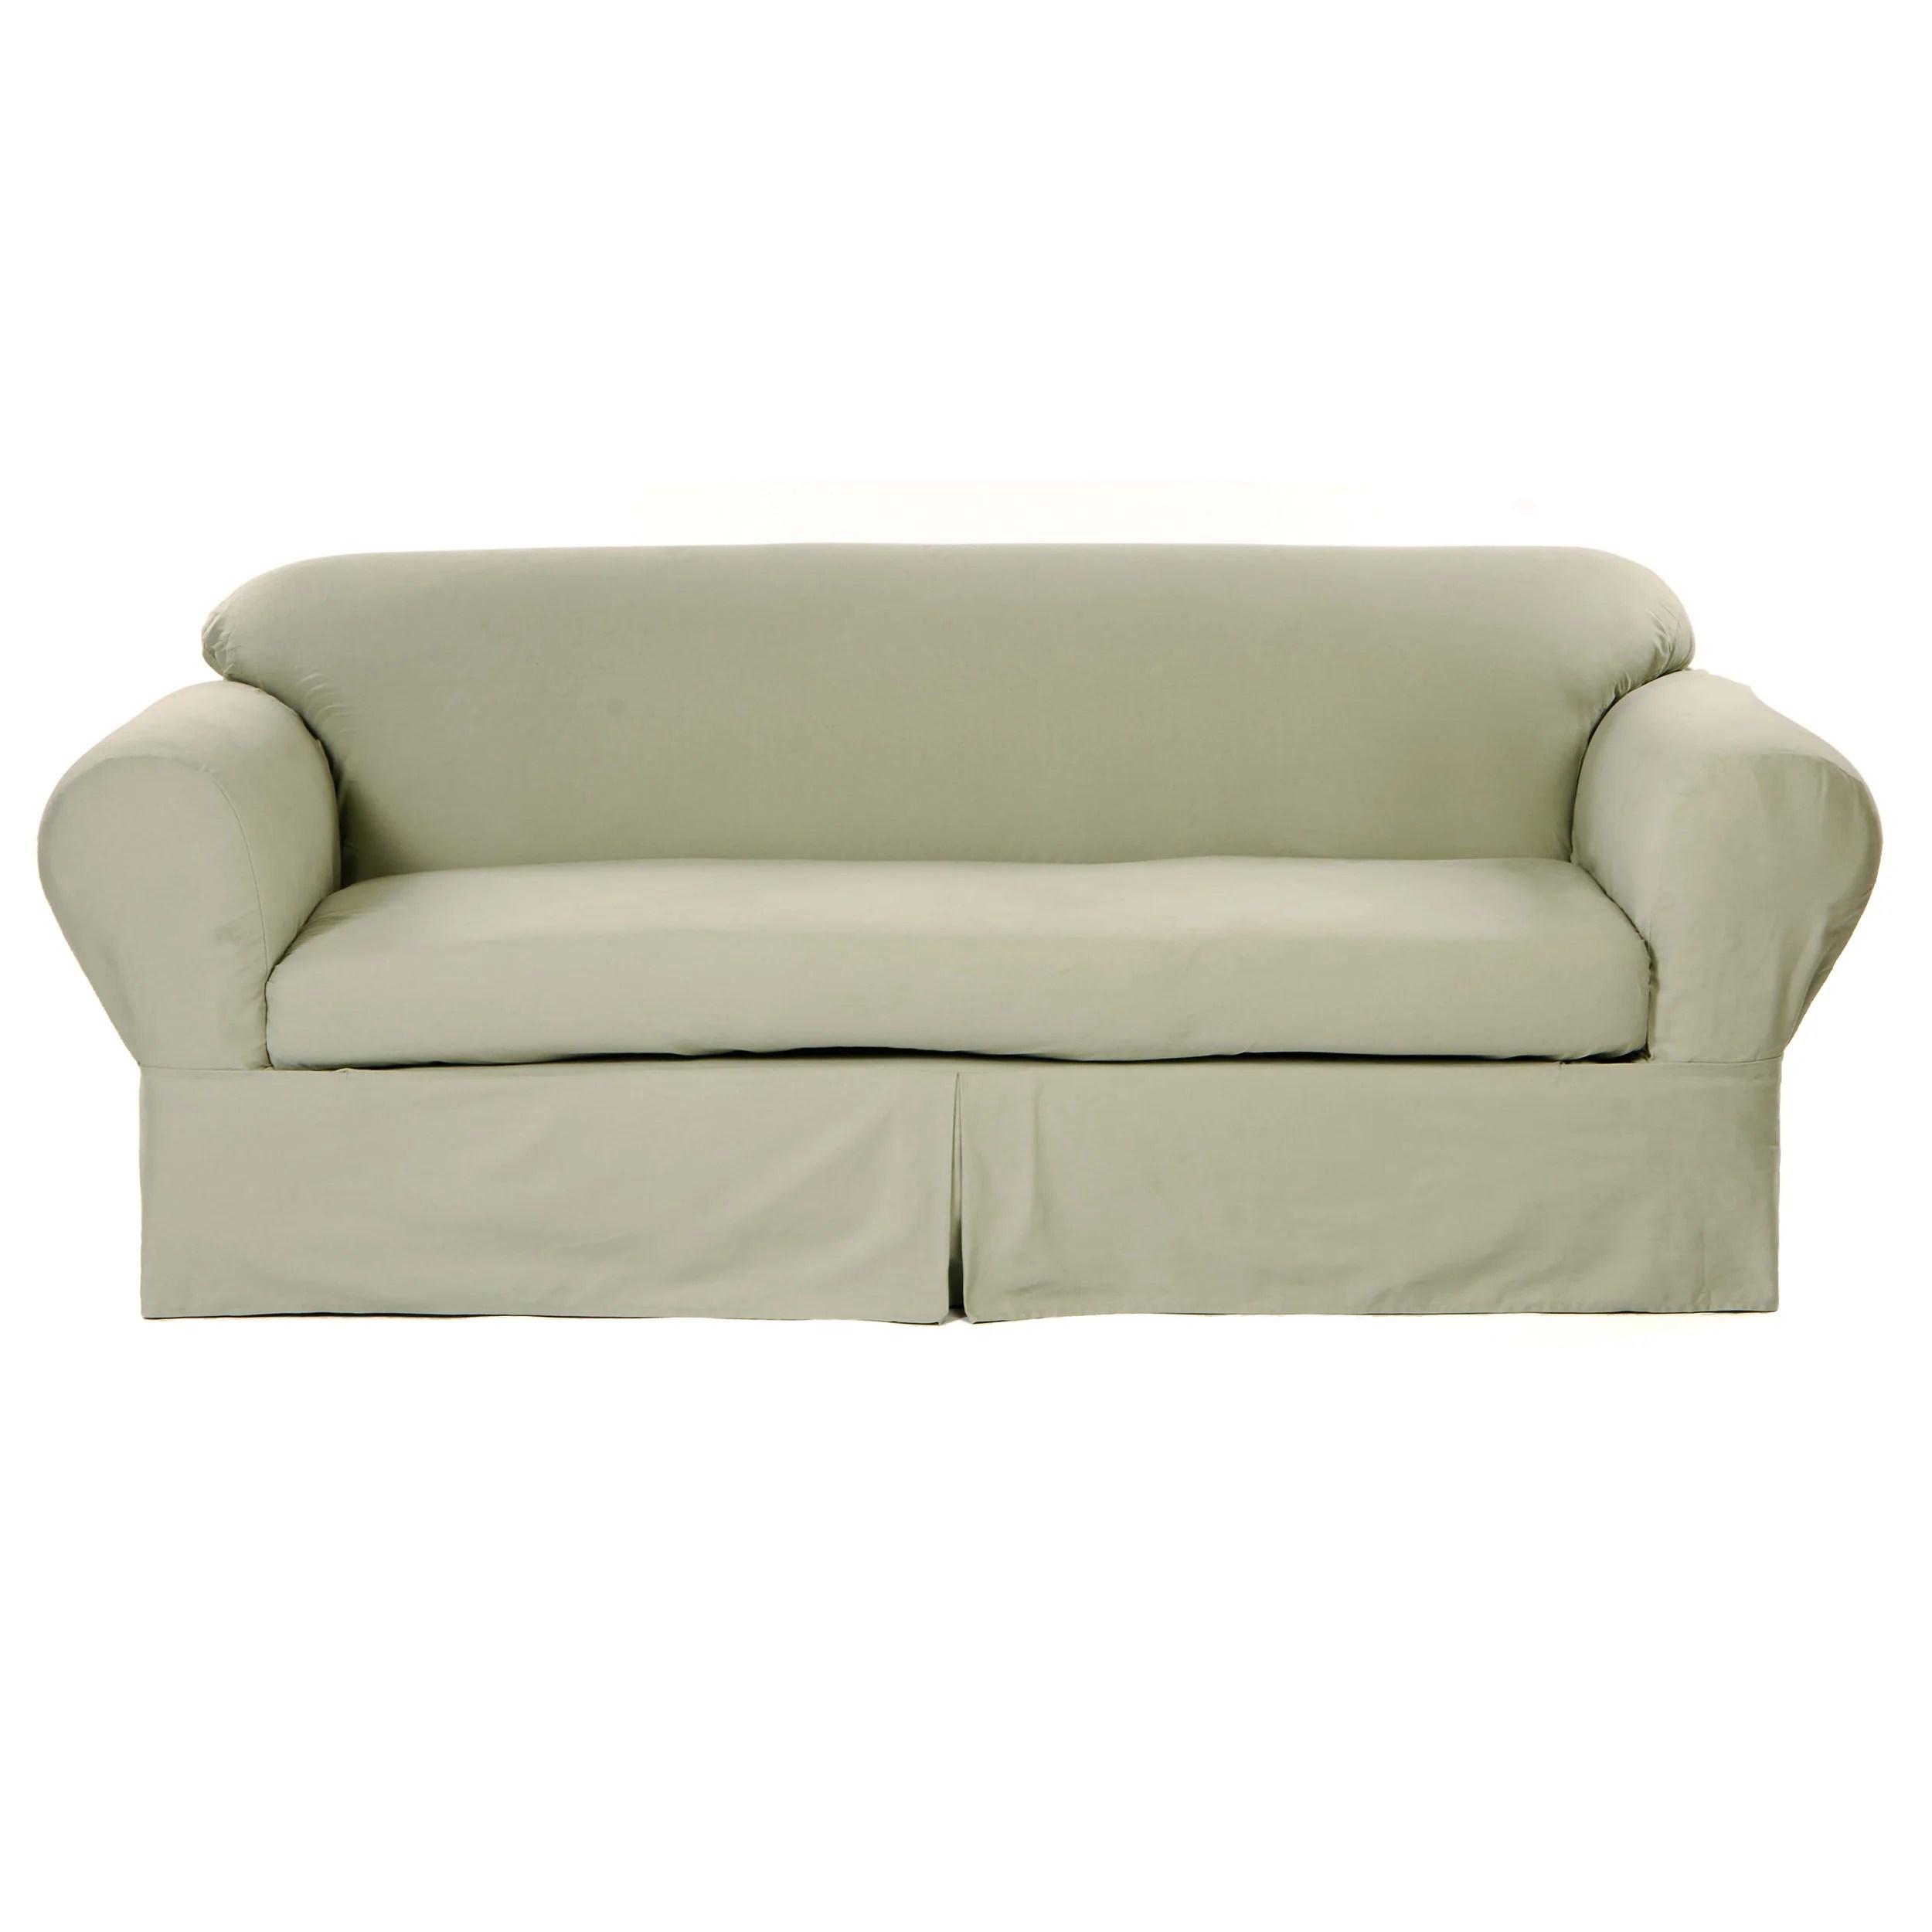 classic slipcovers 2 piece twill sofa slipcover